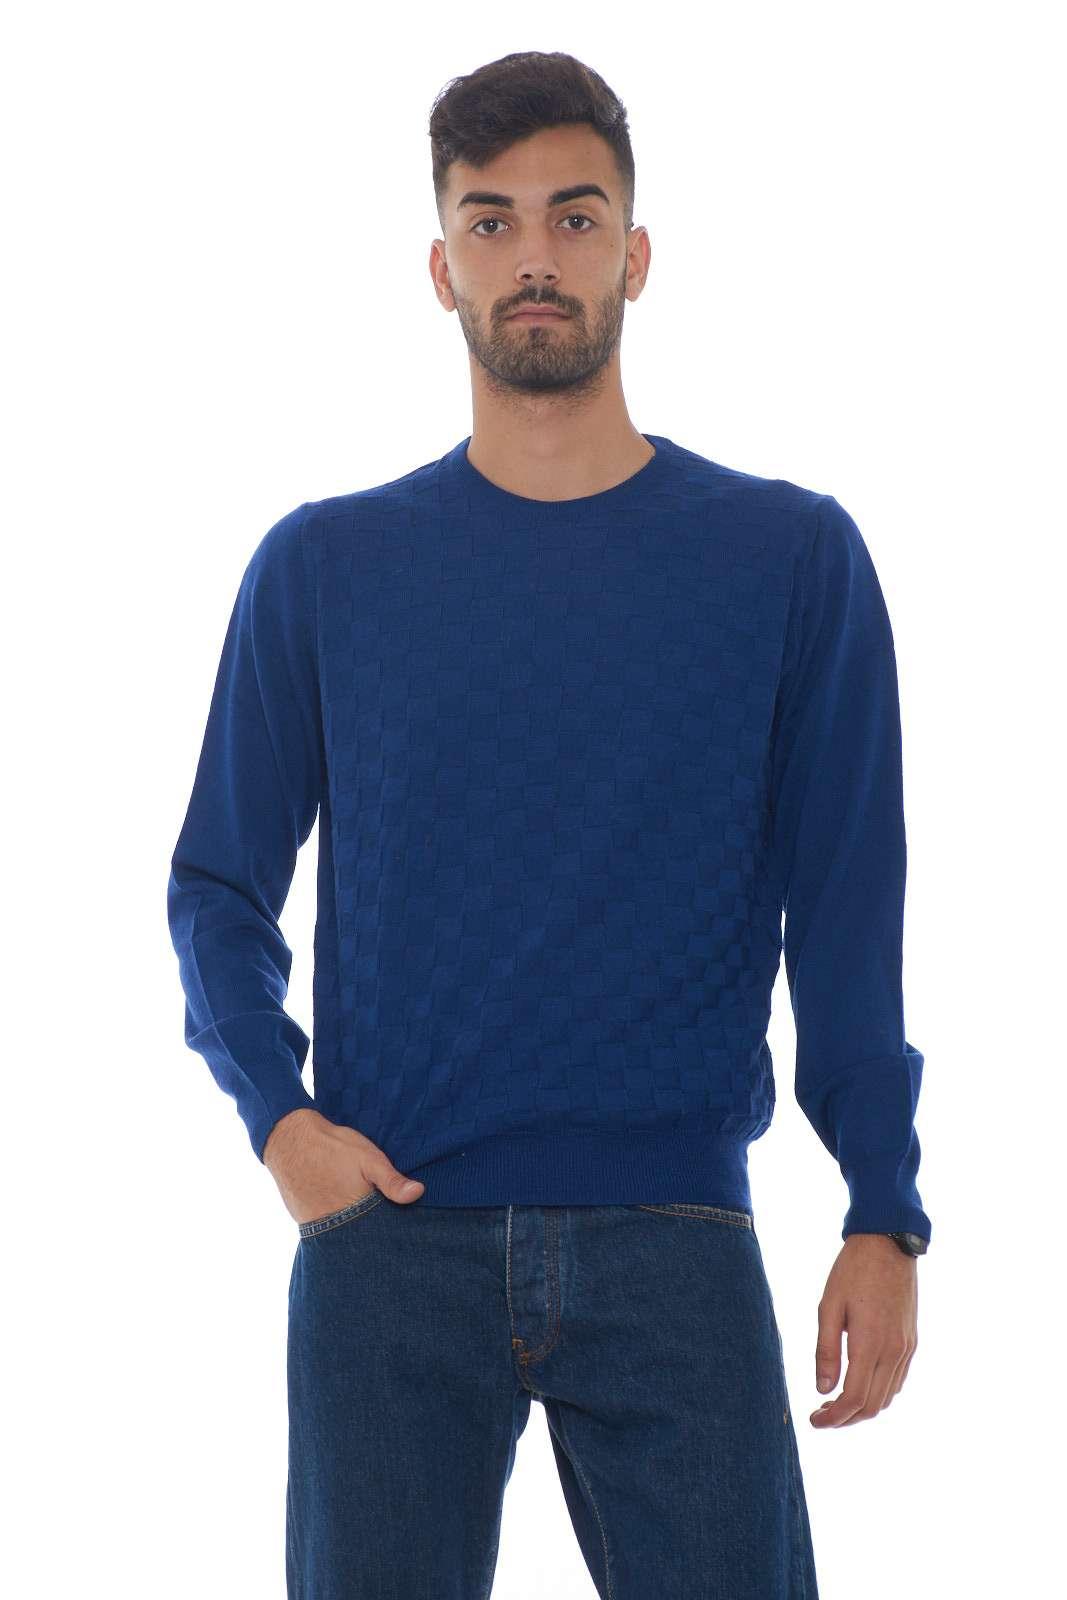 https://www.parmax.com/media/catalog/product/a/i/AI-outlet_parmax-maglia-uomo-Acquapura-007-A.jpg